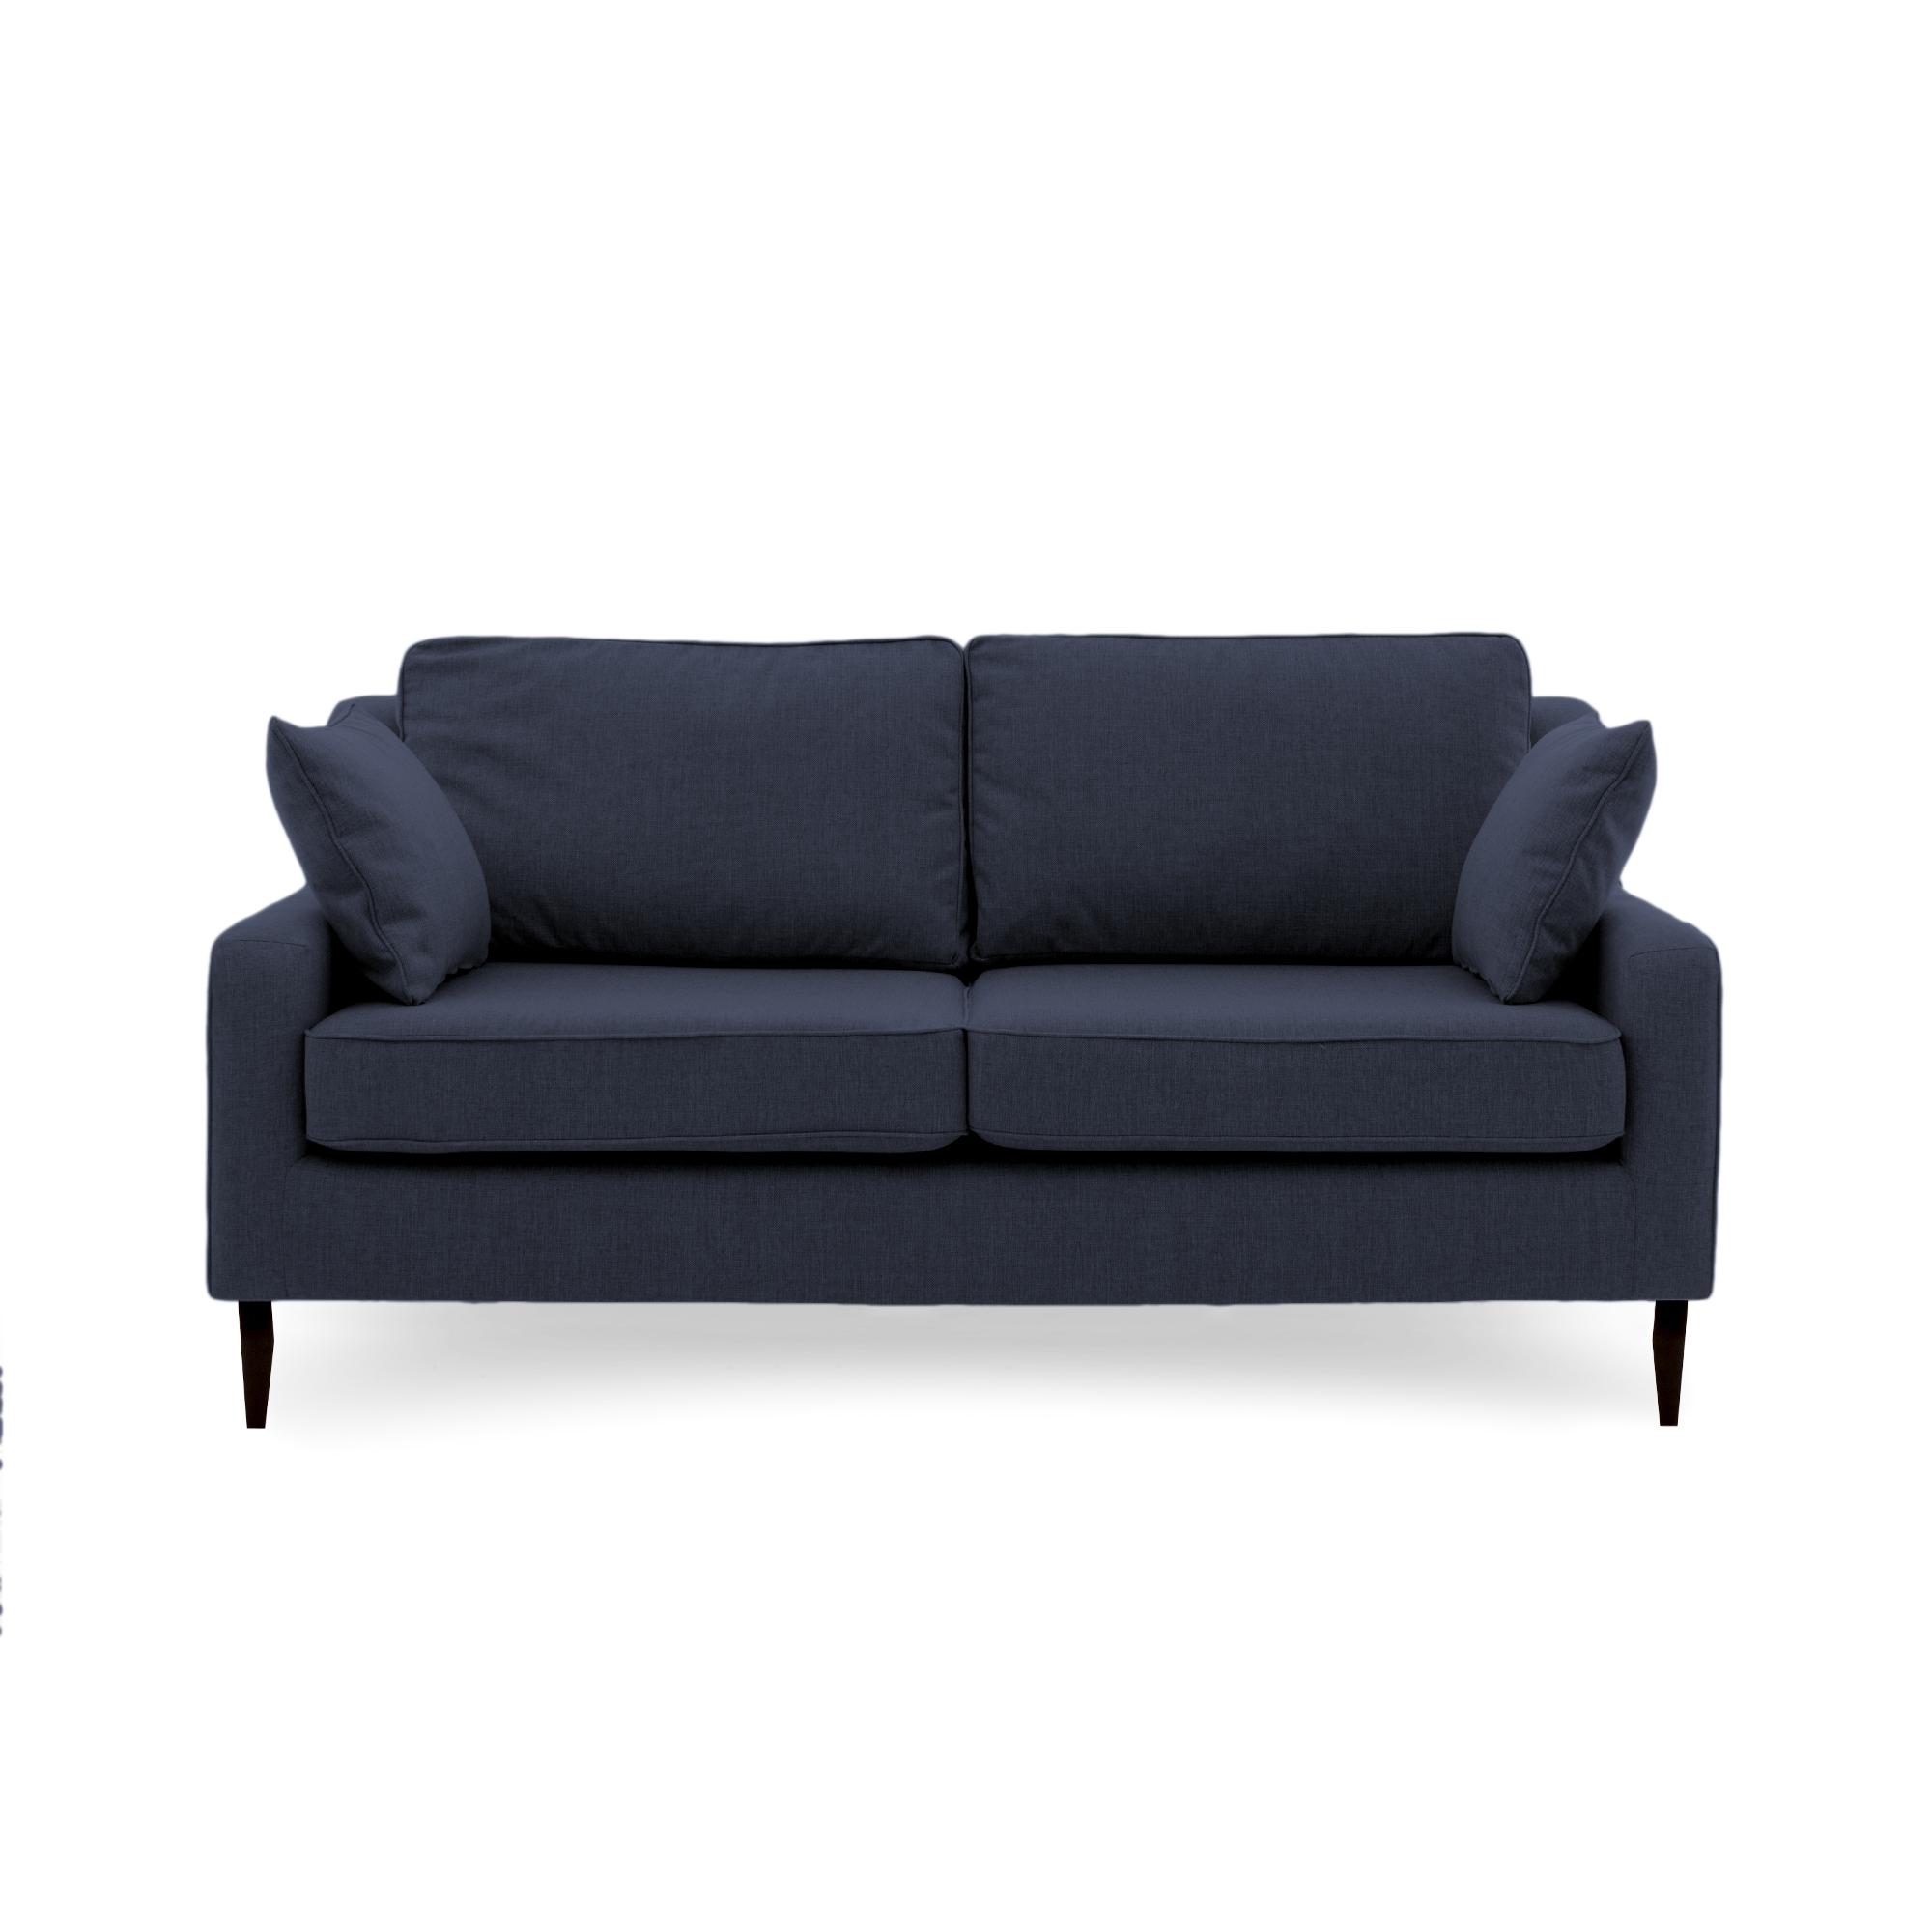 Canapea Fixa 3 locuri Bond Navy Blue